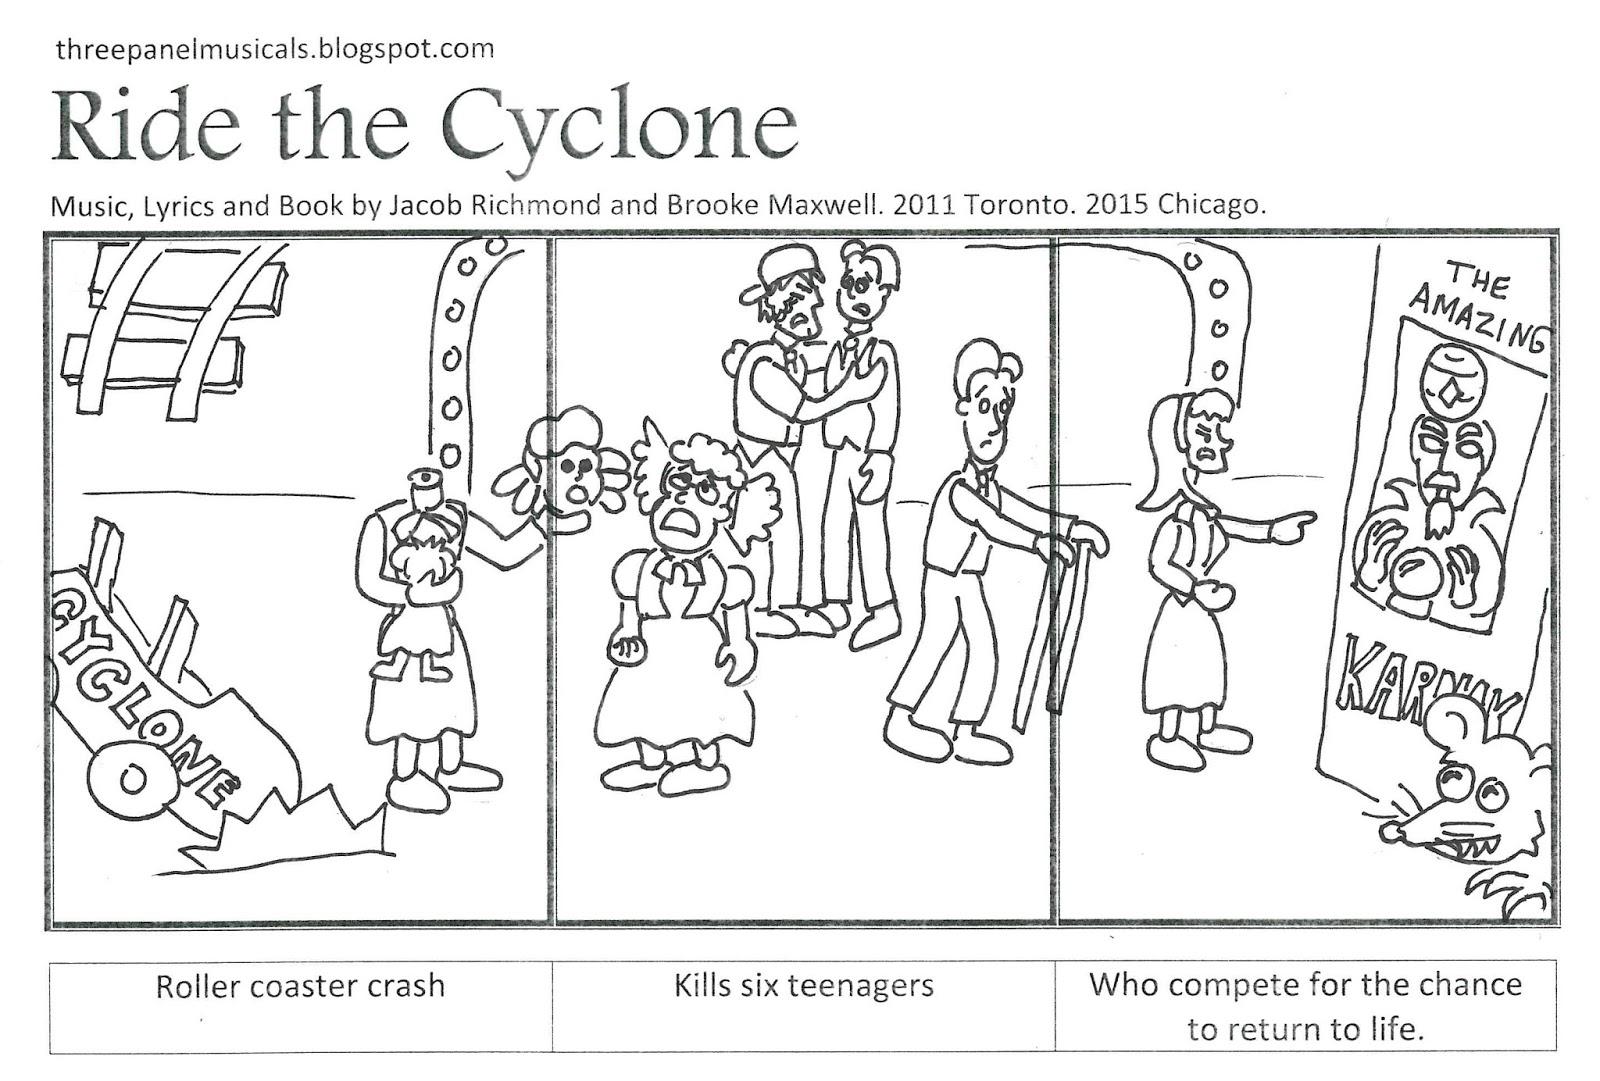 three panel musicals  ride the cyclone